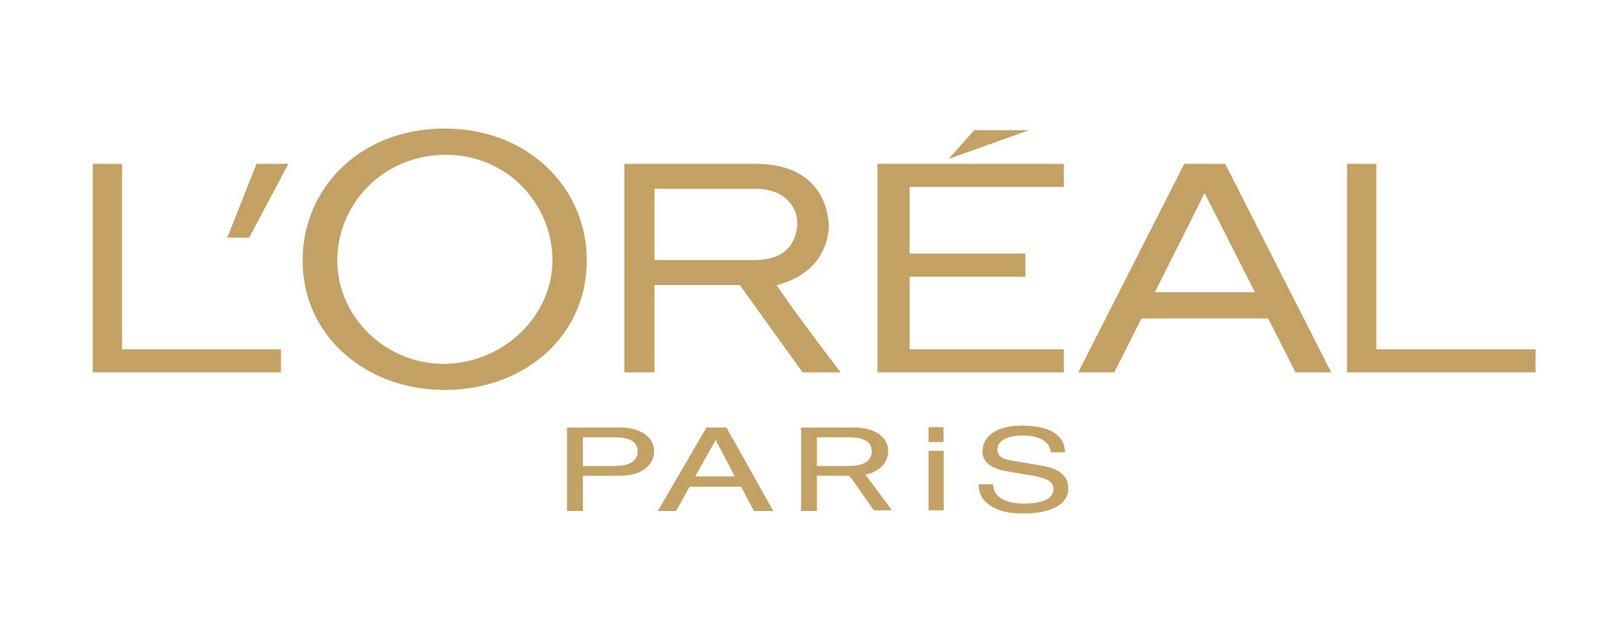 L'Oreal Paris Logo